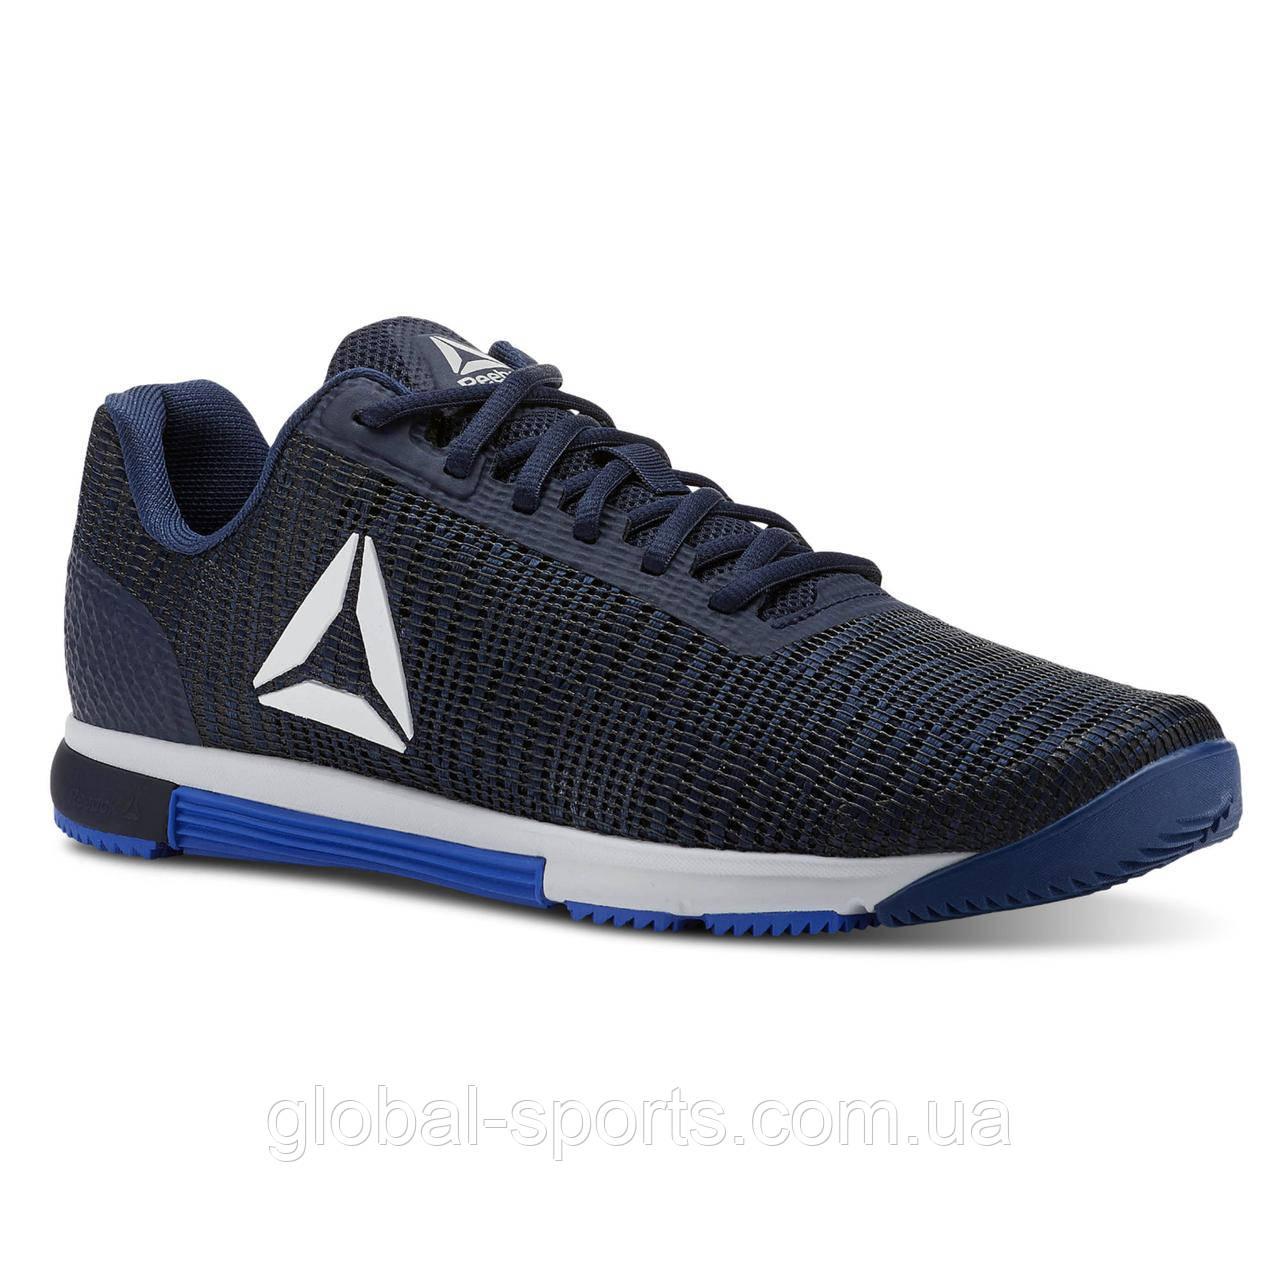 Мужские кроссовки Reebok Speed TR Flexweave(Артикул:CN5503)